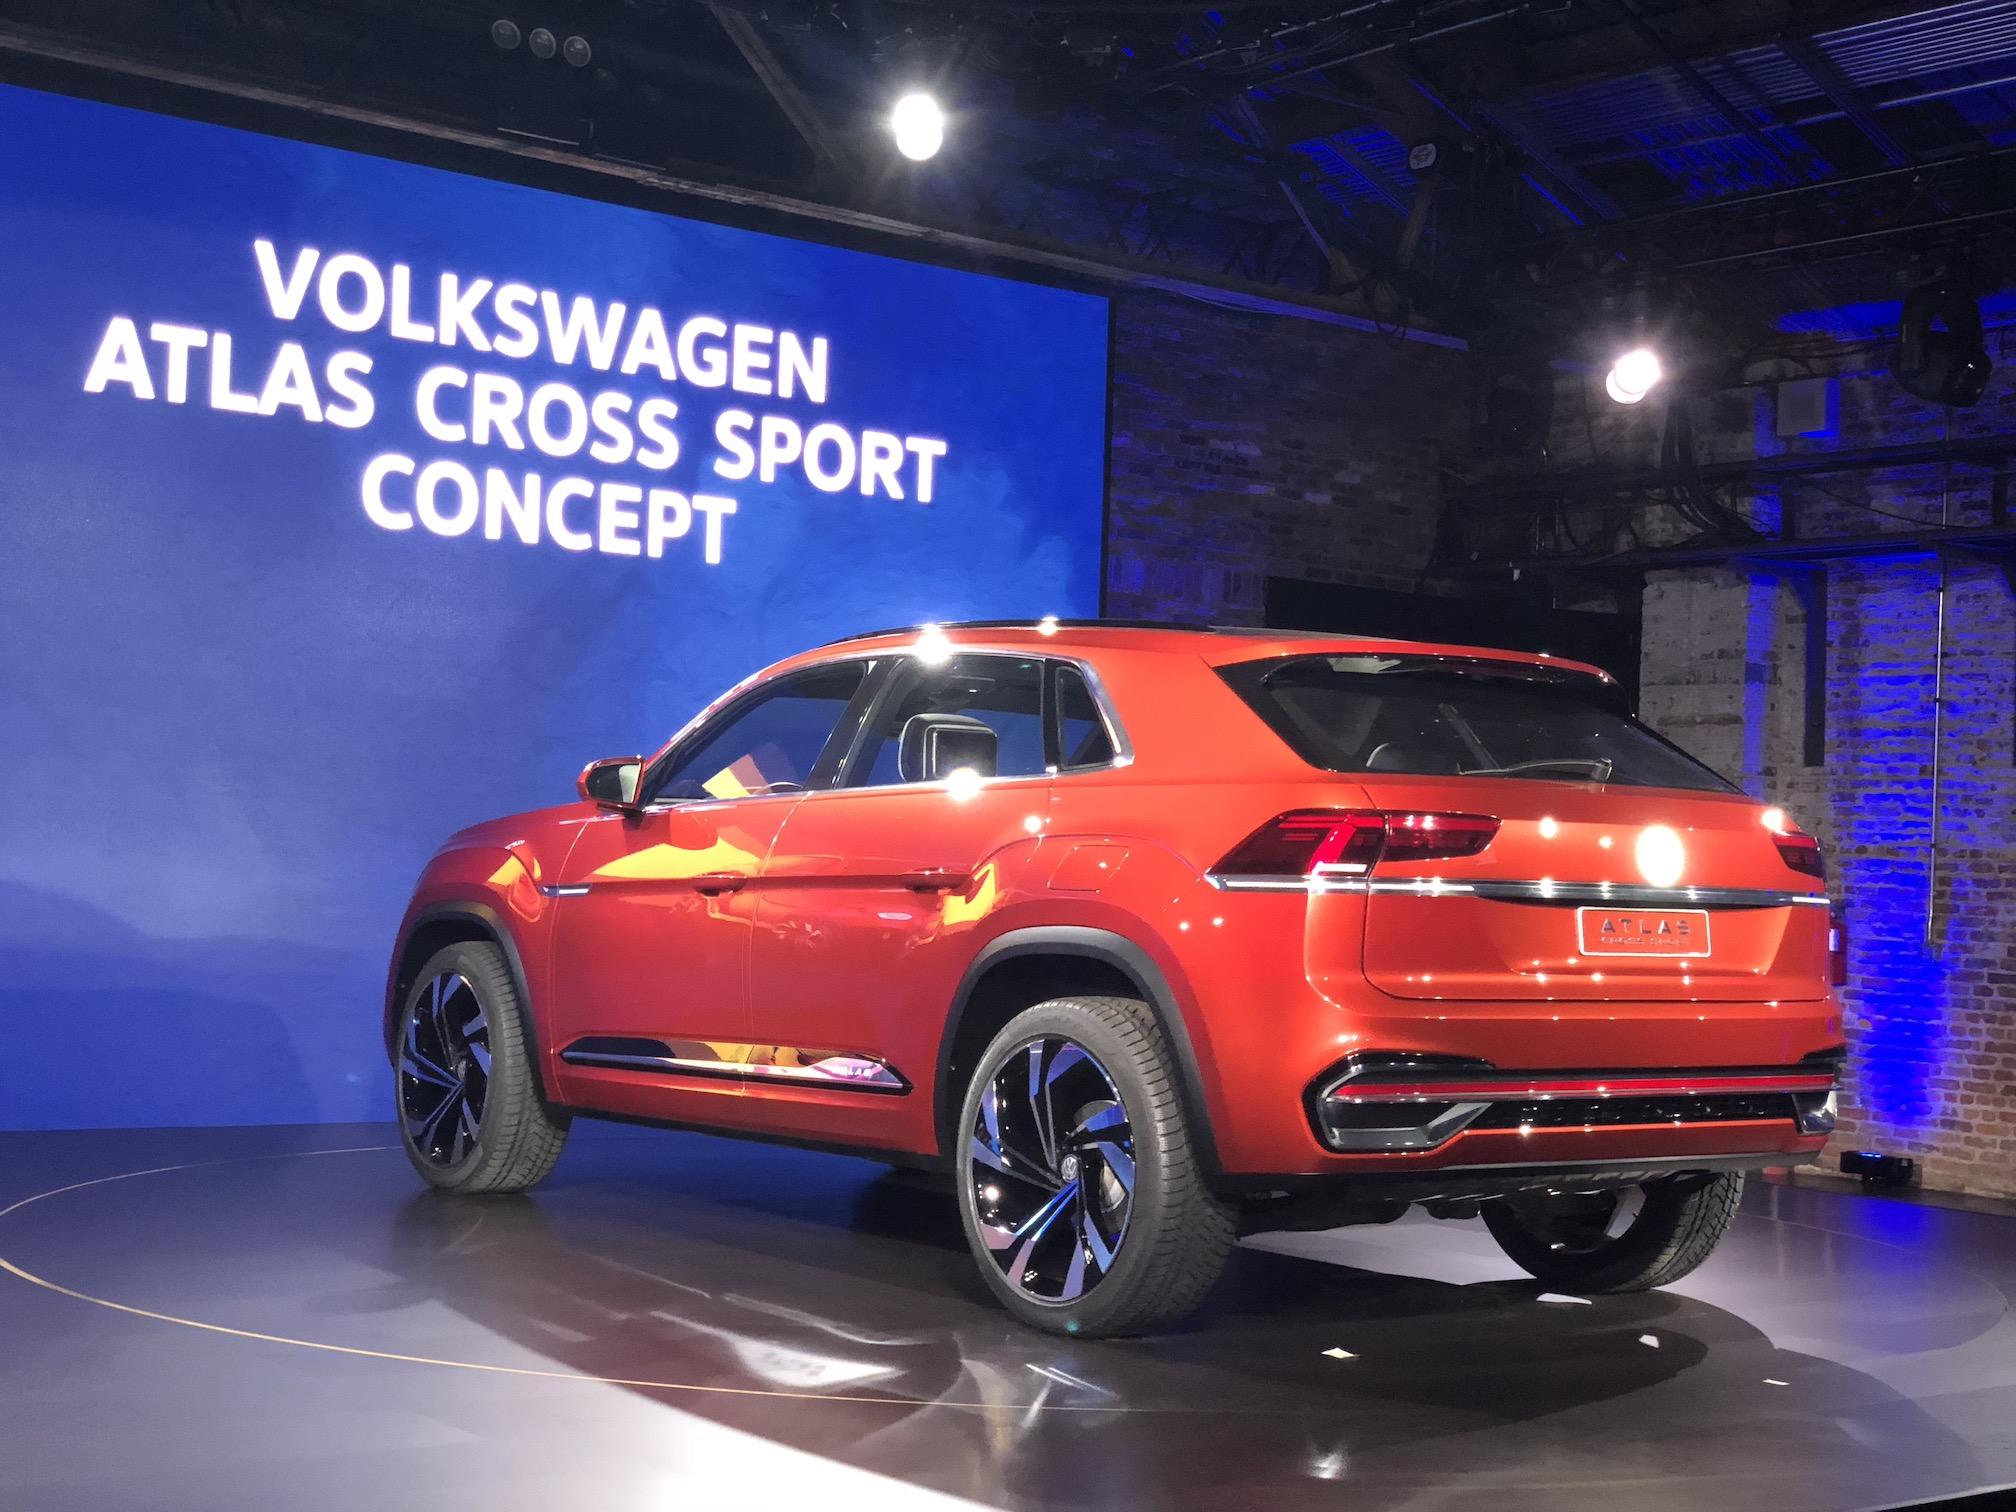 Volkswagen Atlas Cross Sport Concept Automotive Rhythms